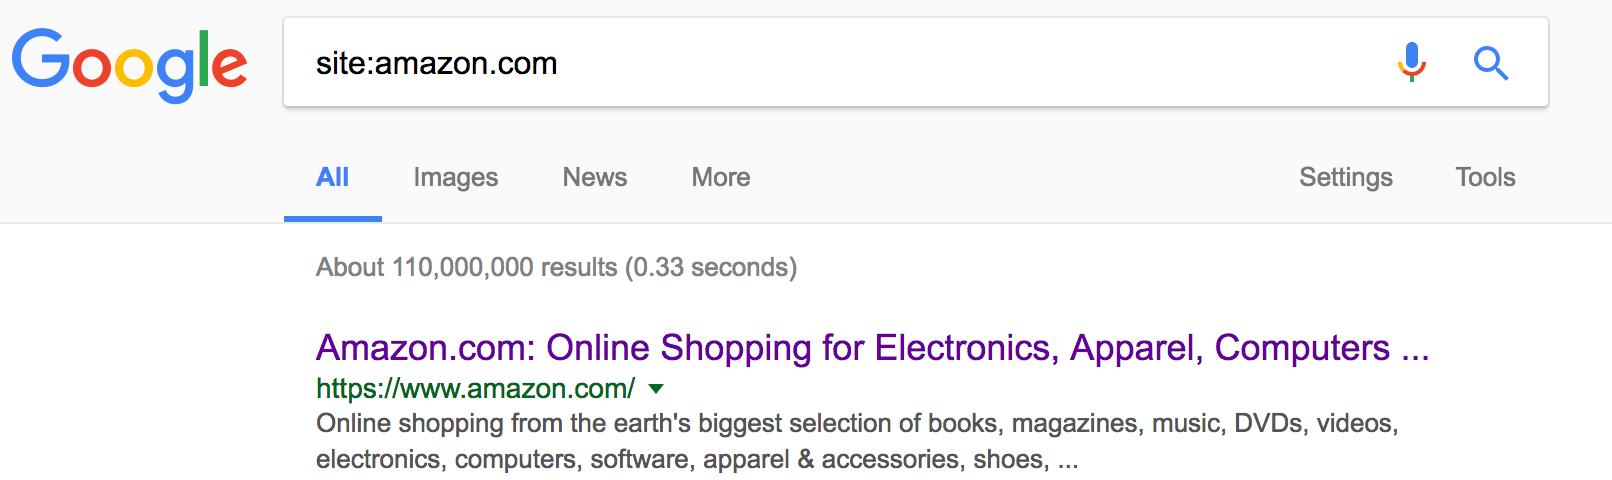 google site structure